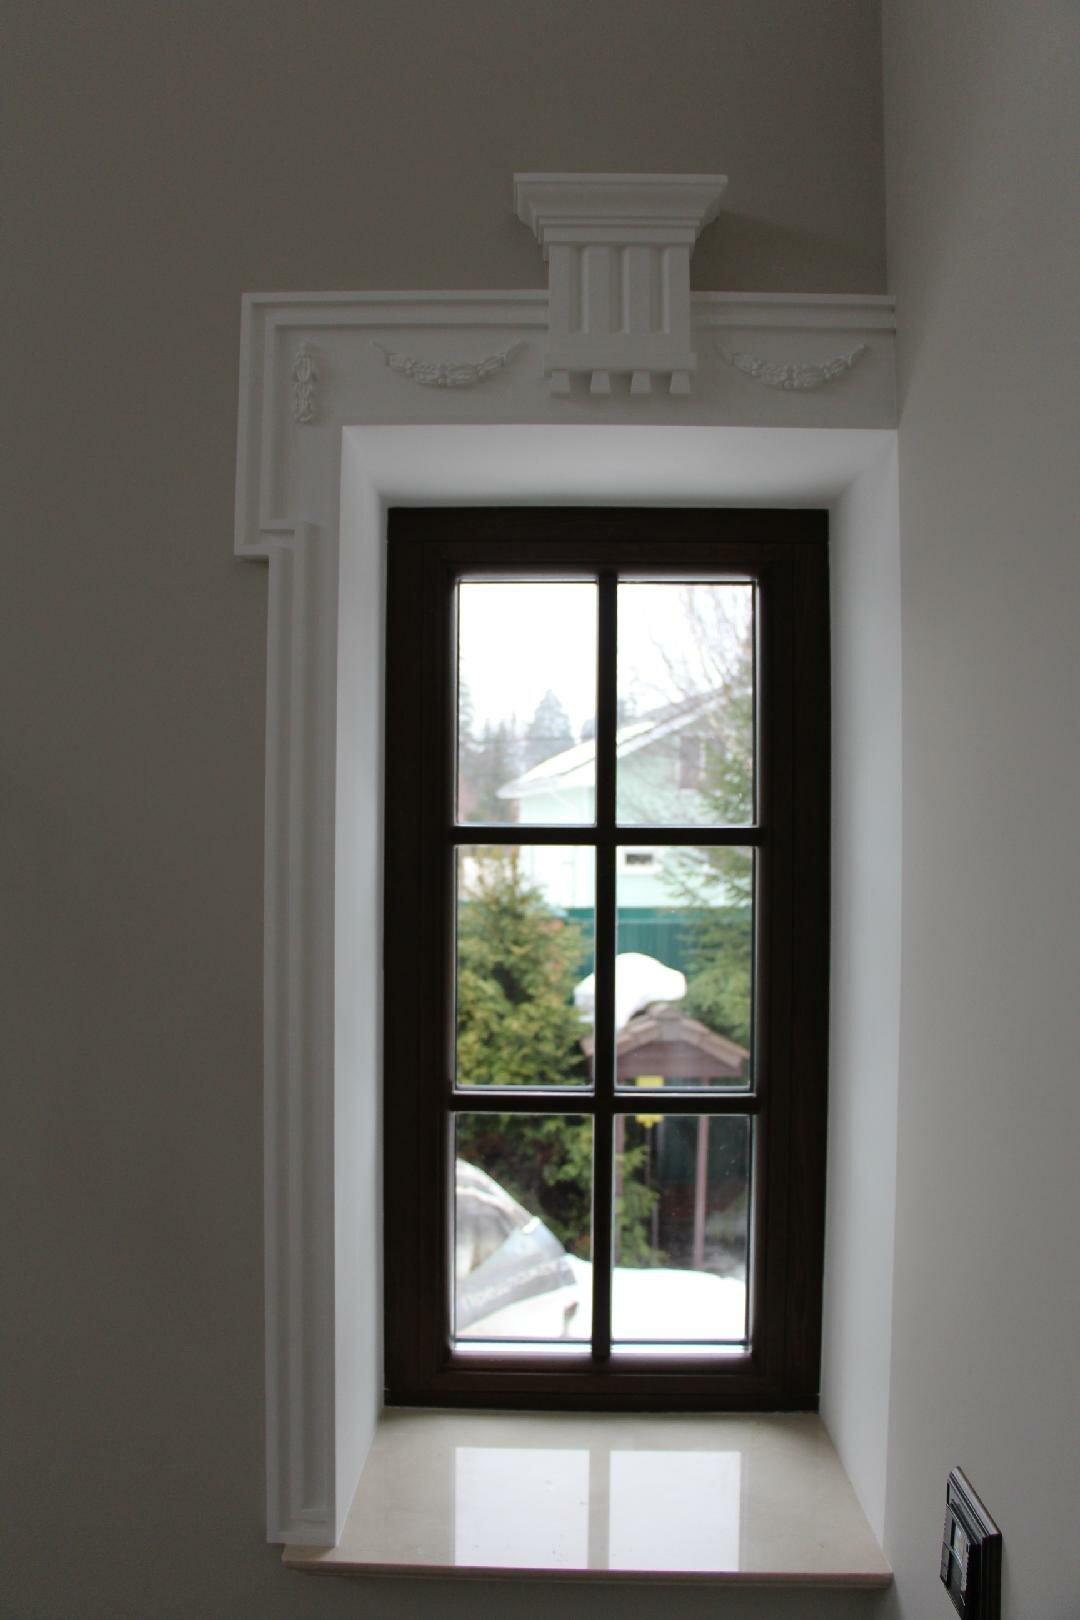 фото обналички на окна из полиуретана жестянщика